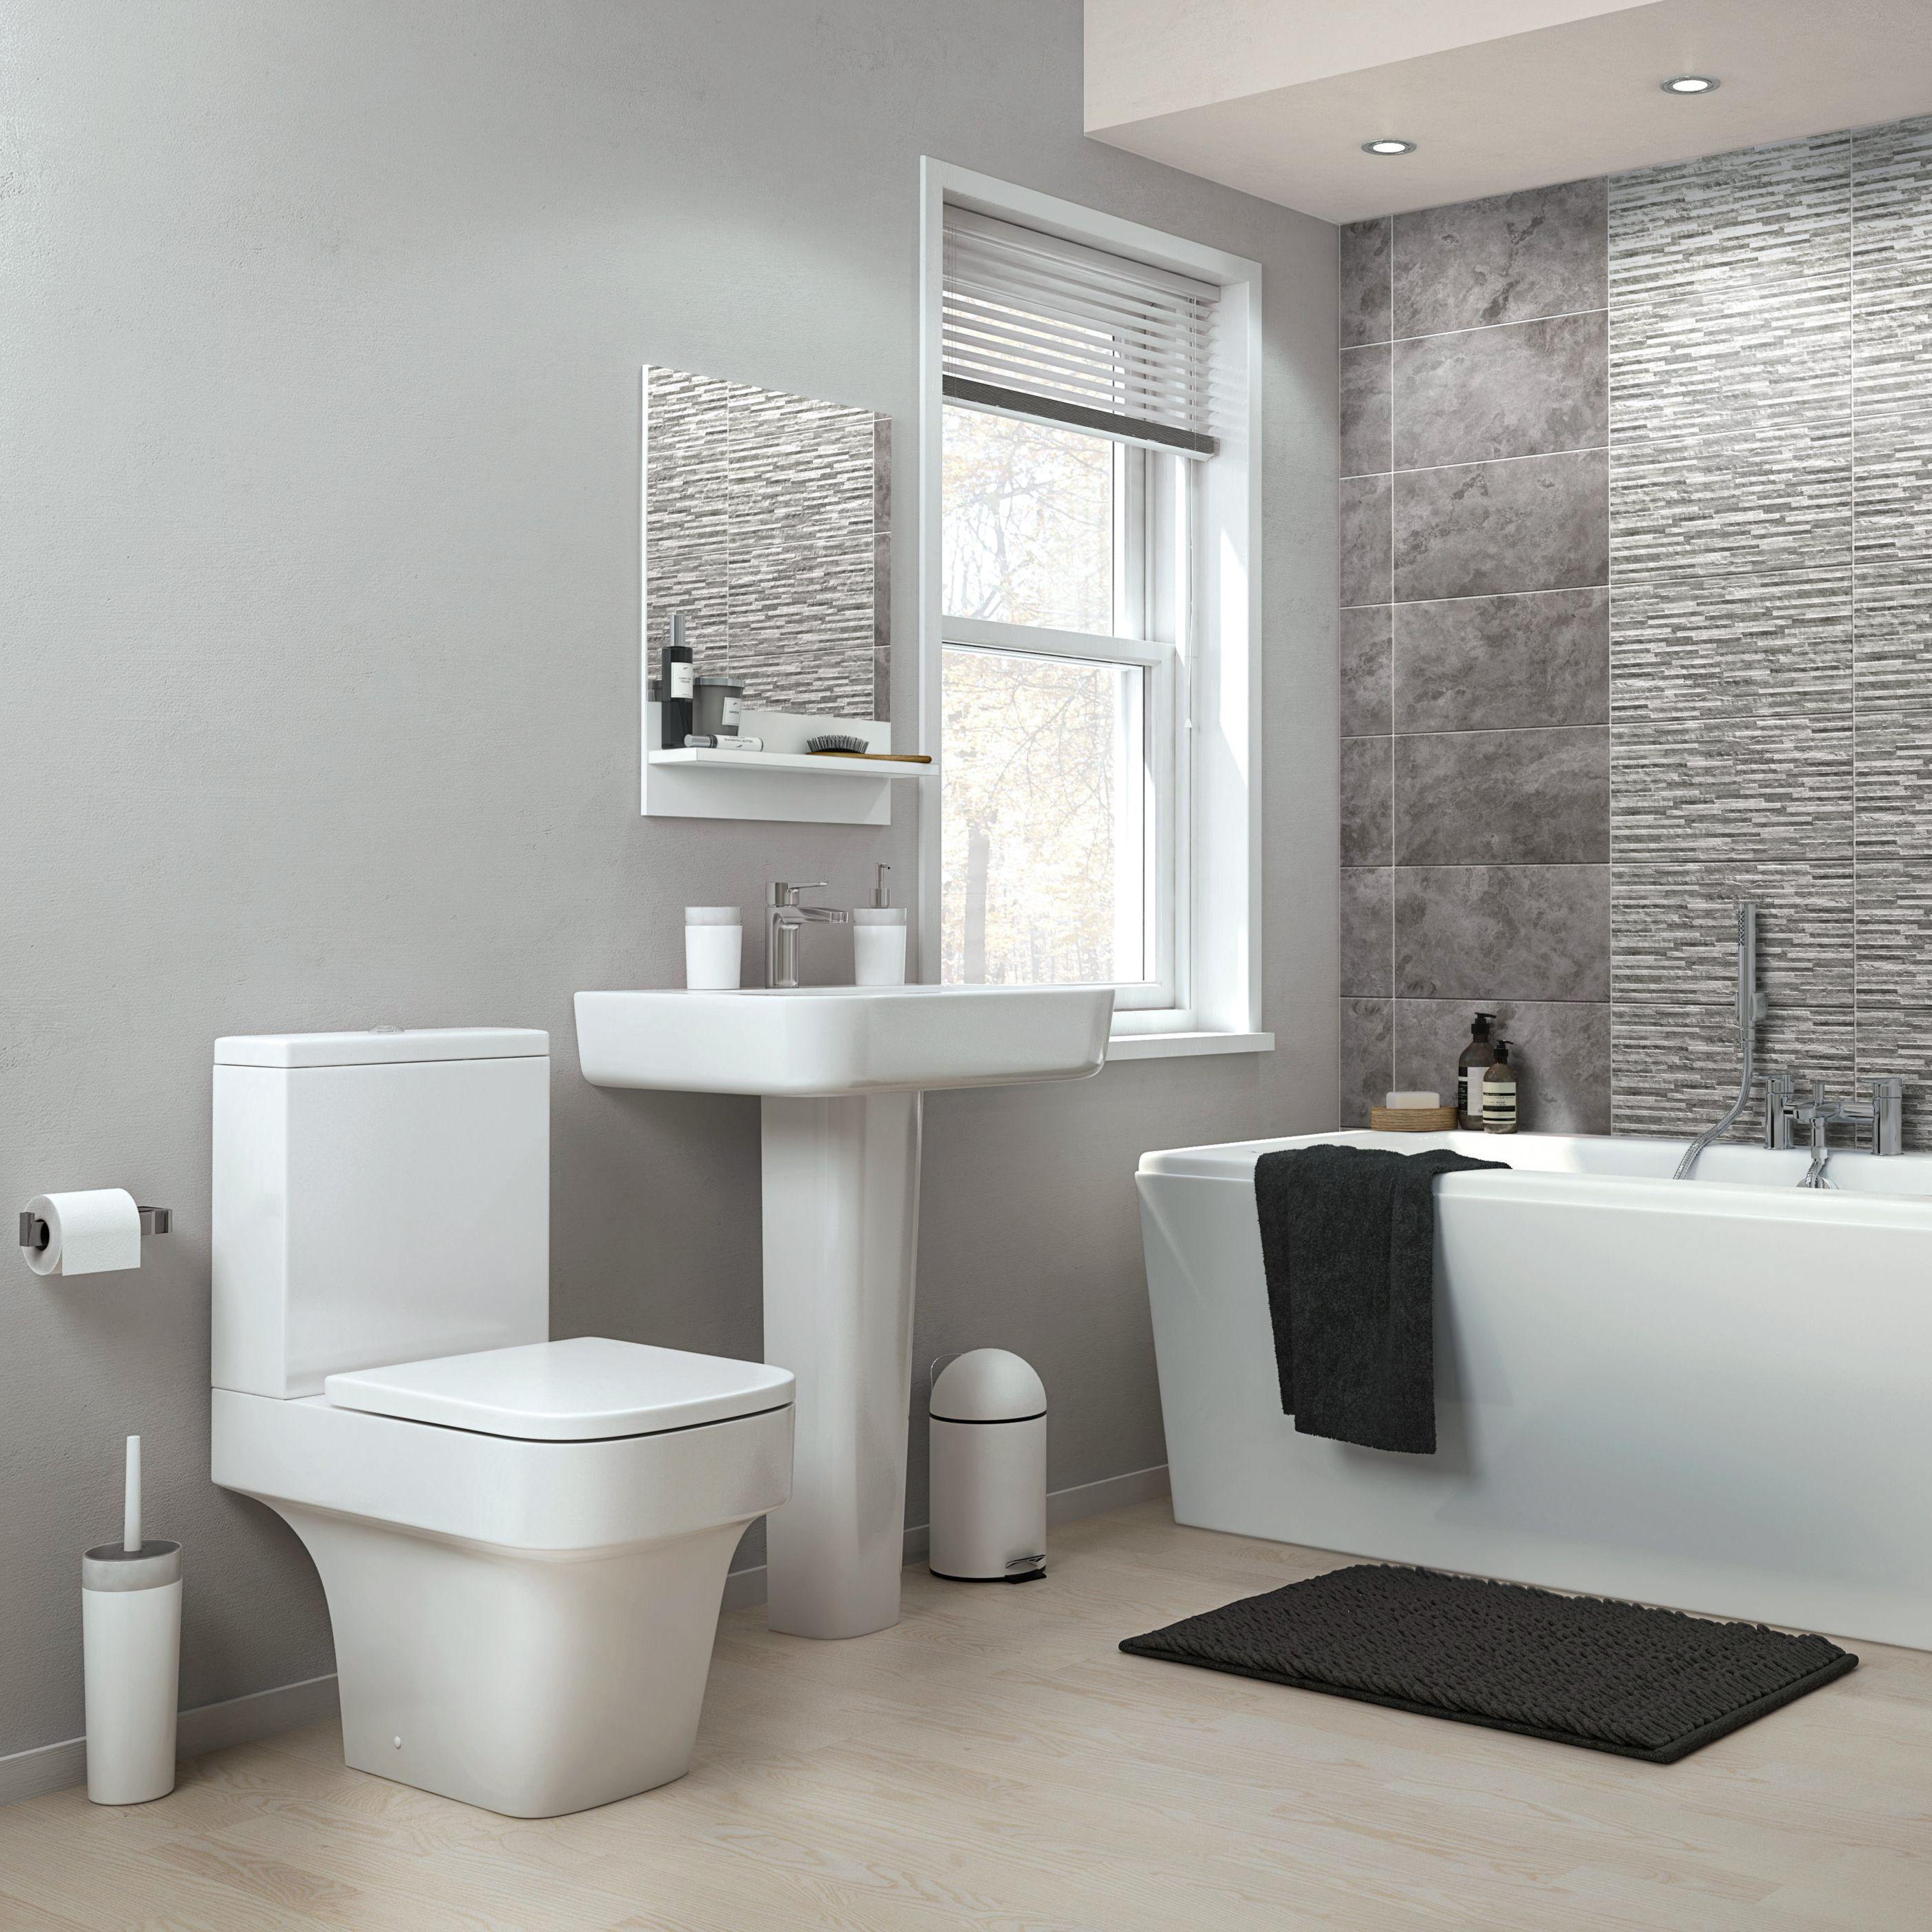 Bathrooms Bathroom Suites Furniture Ideas DIY at BQ